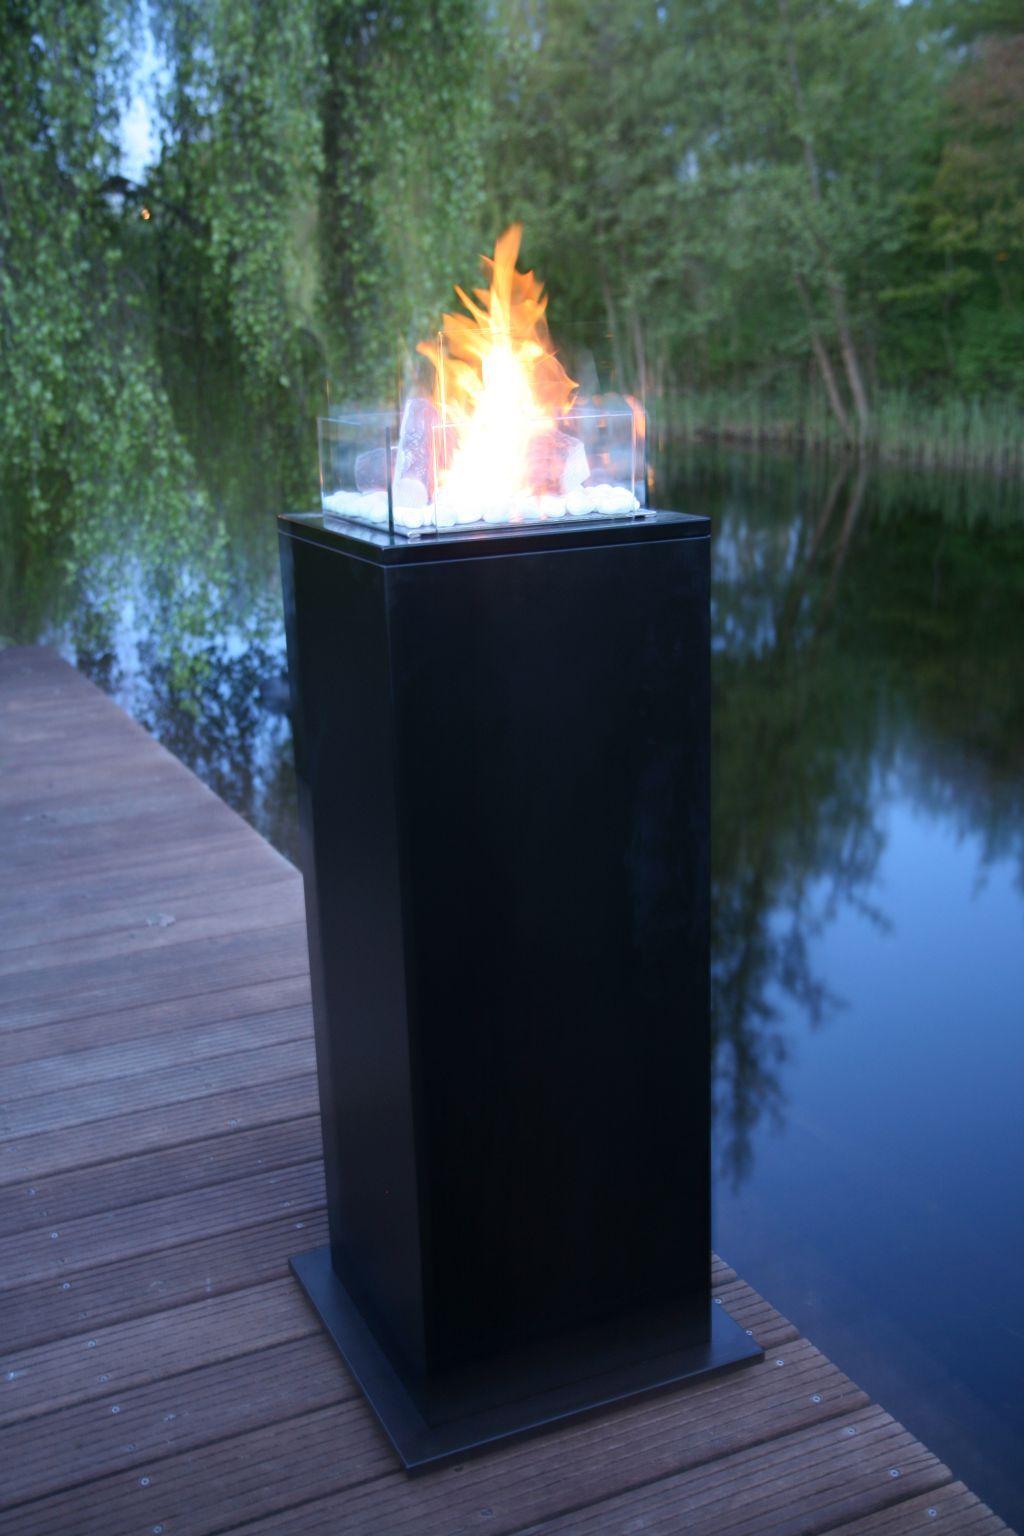 Tuinhaard Sfeerhaard Kolom Pro Feuertisch Feuerstelle Feuer